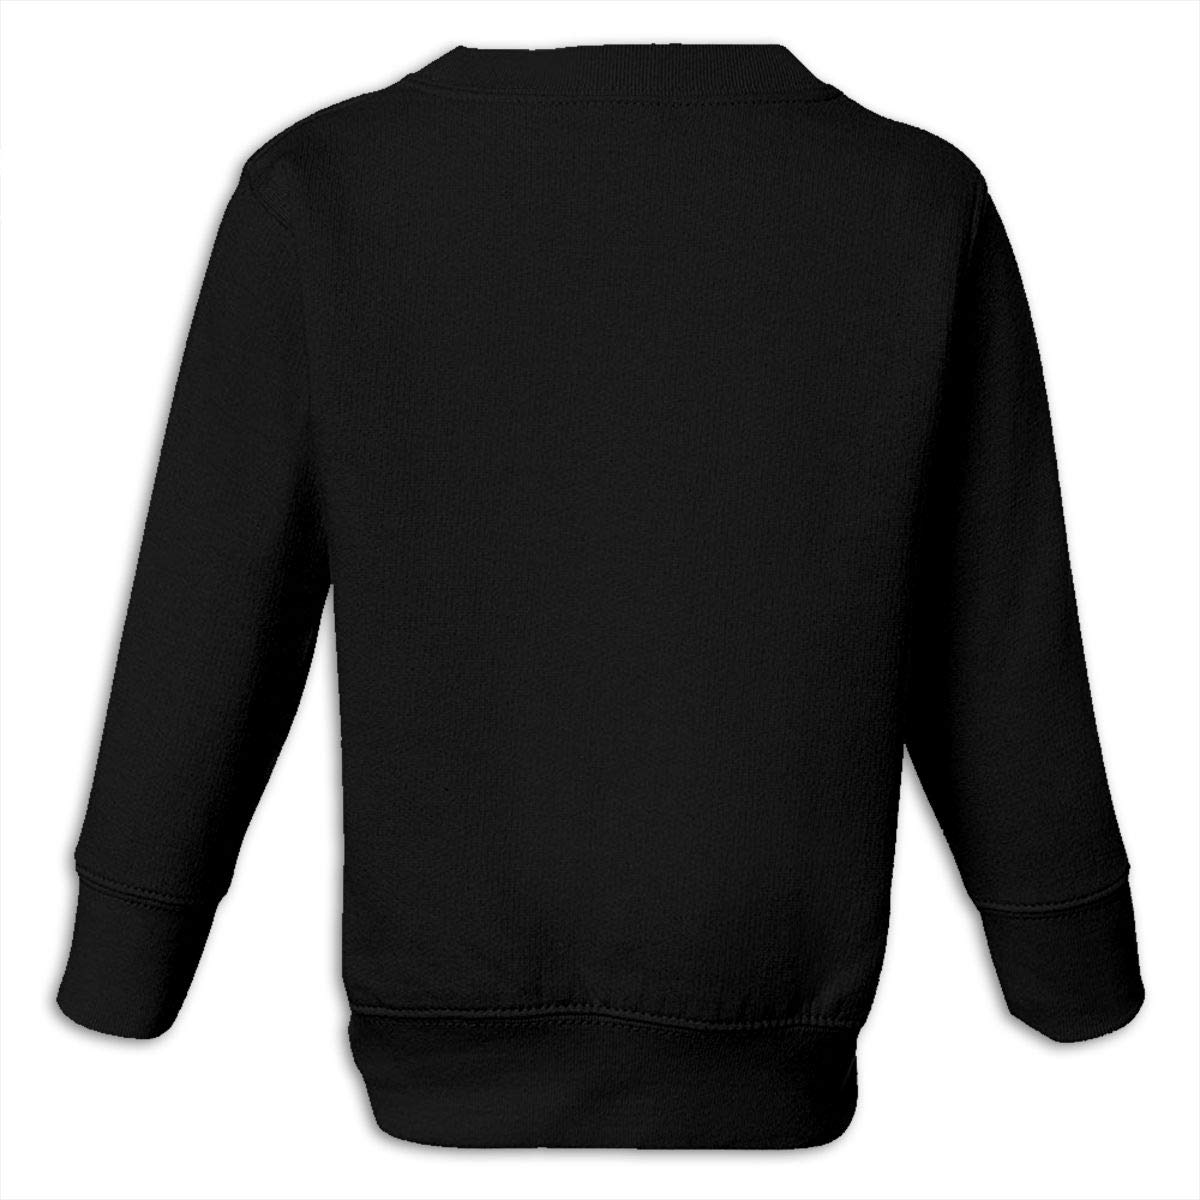 Yuliang Tv Girl Personality Sweater Black